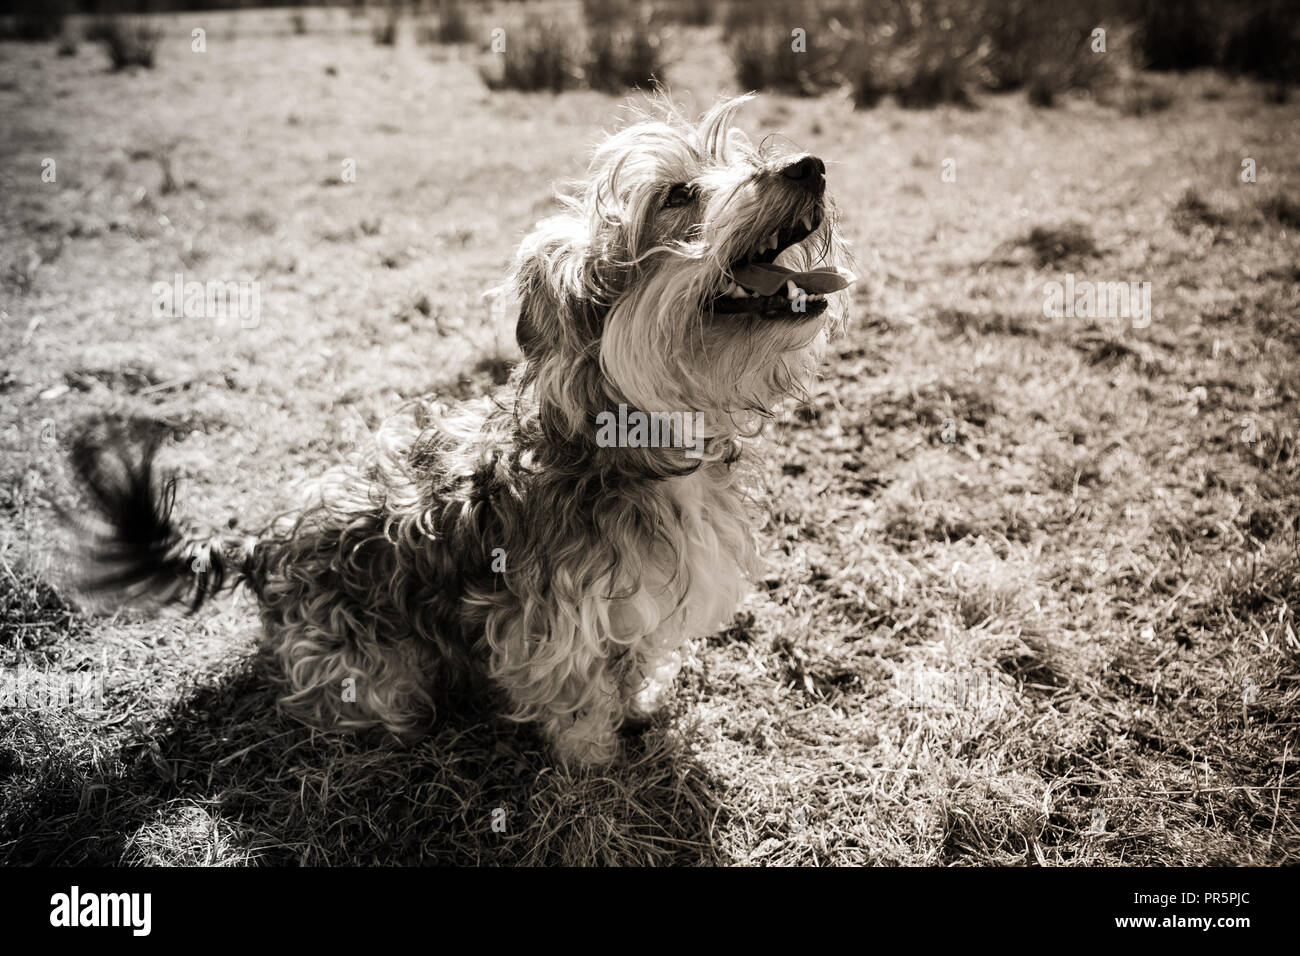 Photo de reno un Yorkshire terreur/ Jack Russell onn une promenade Photo Stock